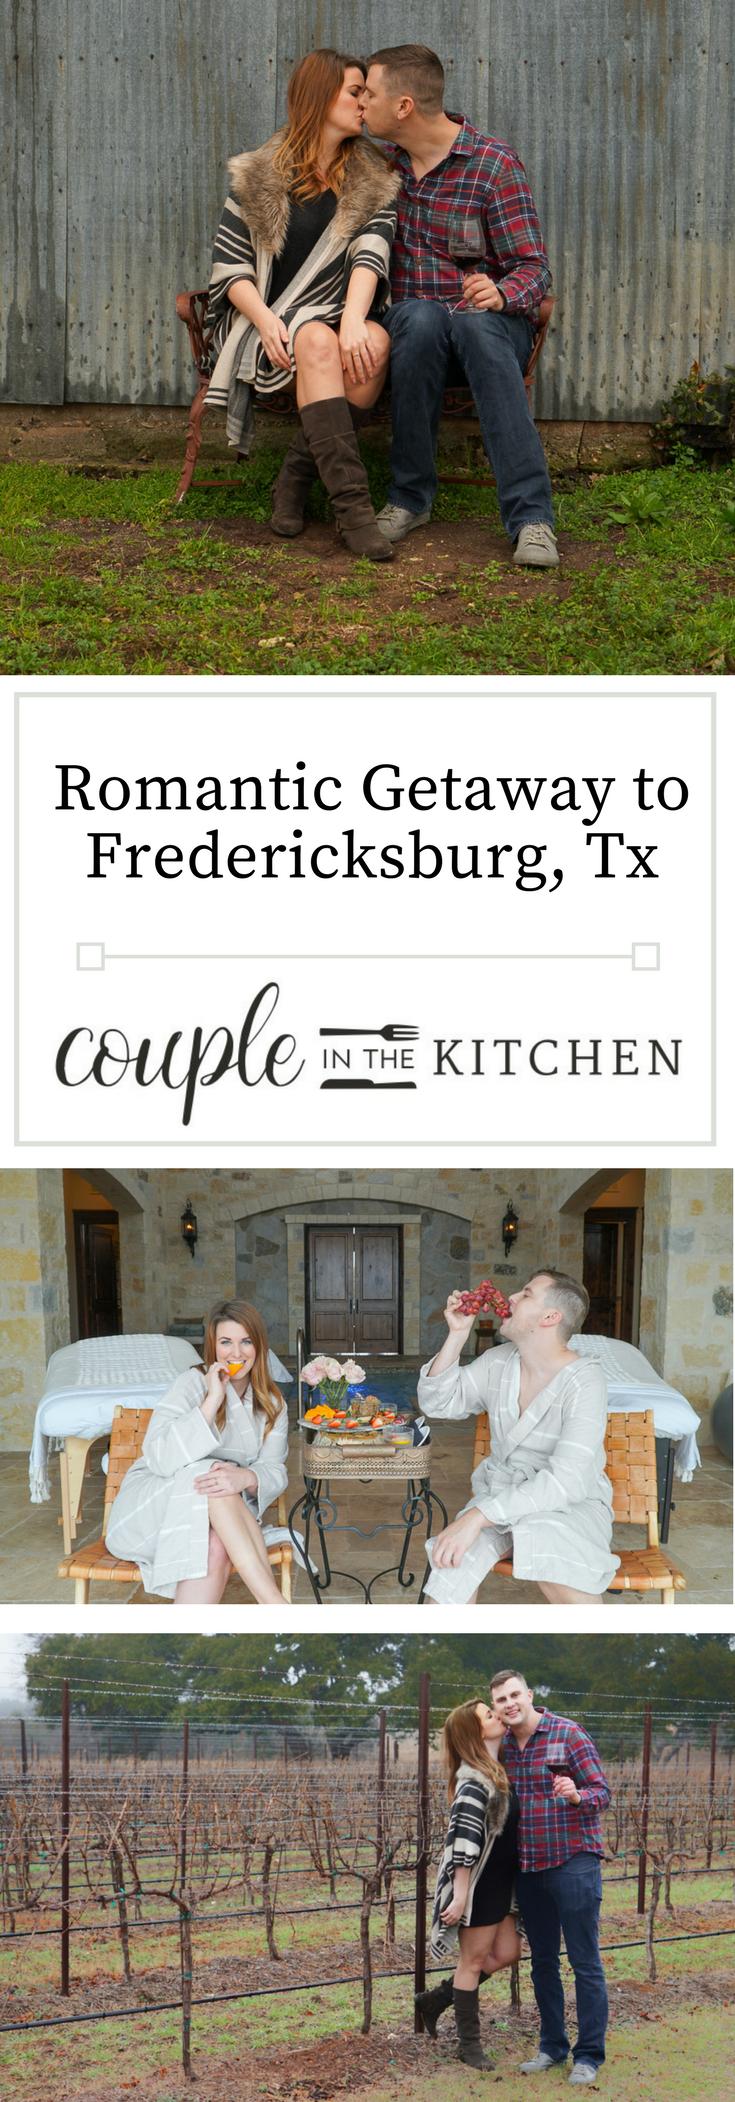 Romantic Getaway to Fredericksburg, Tx _ coupleinthekitchen.com.png